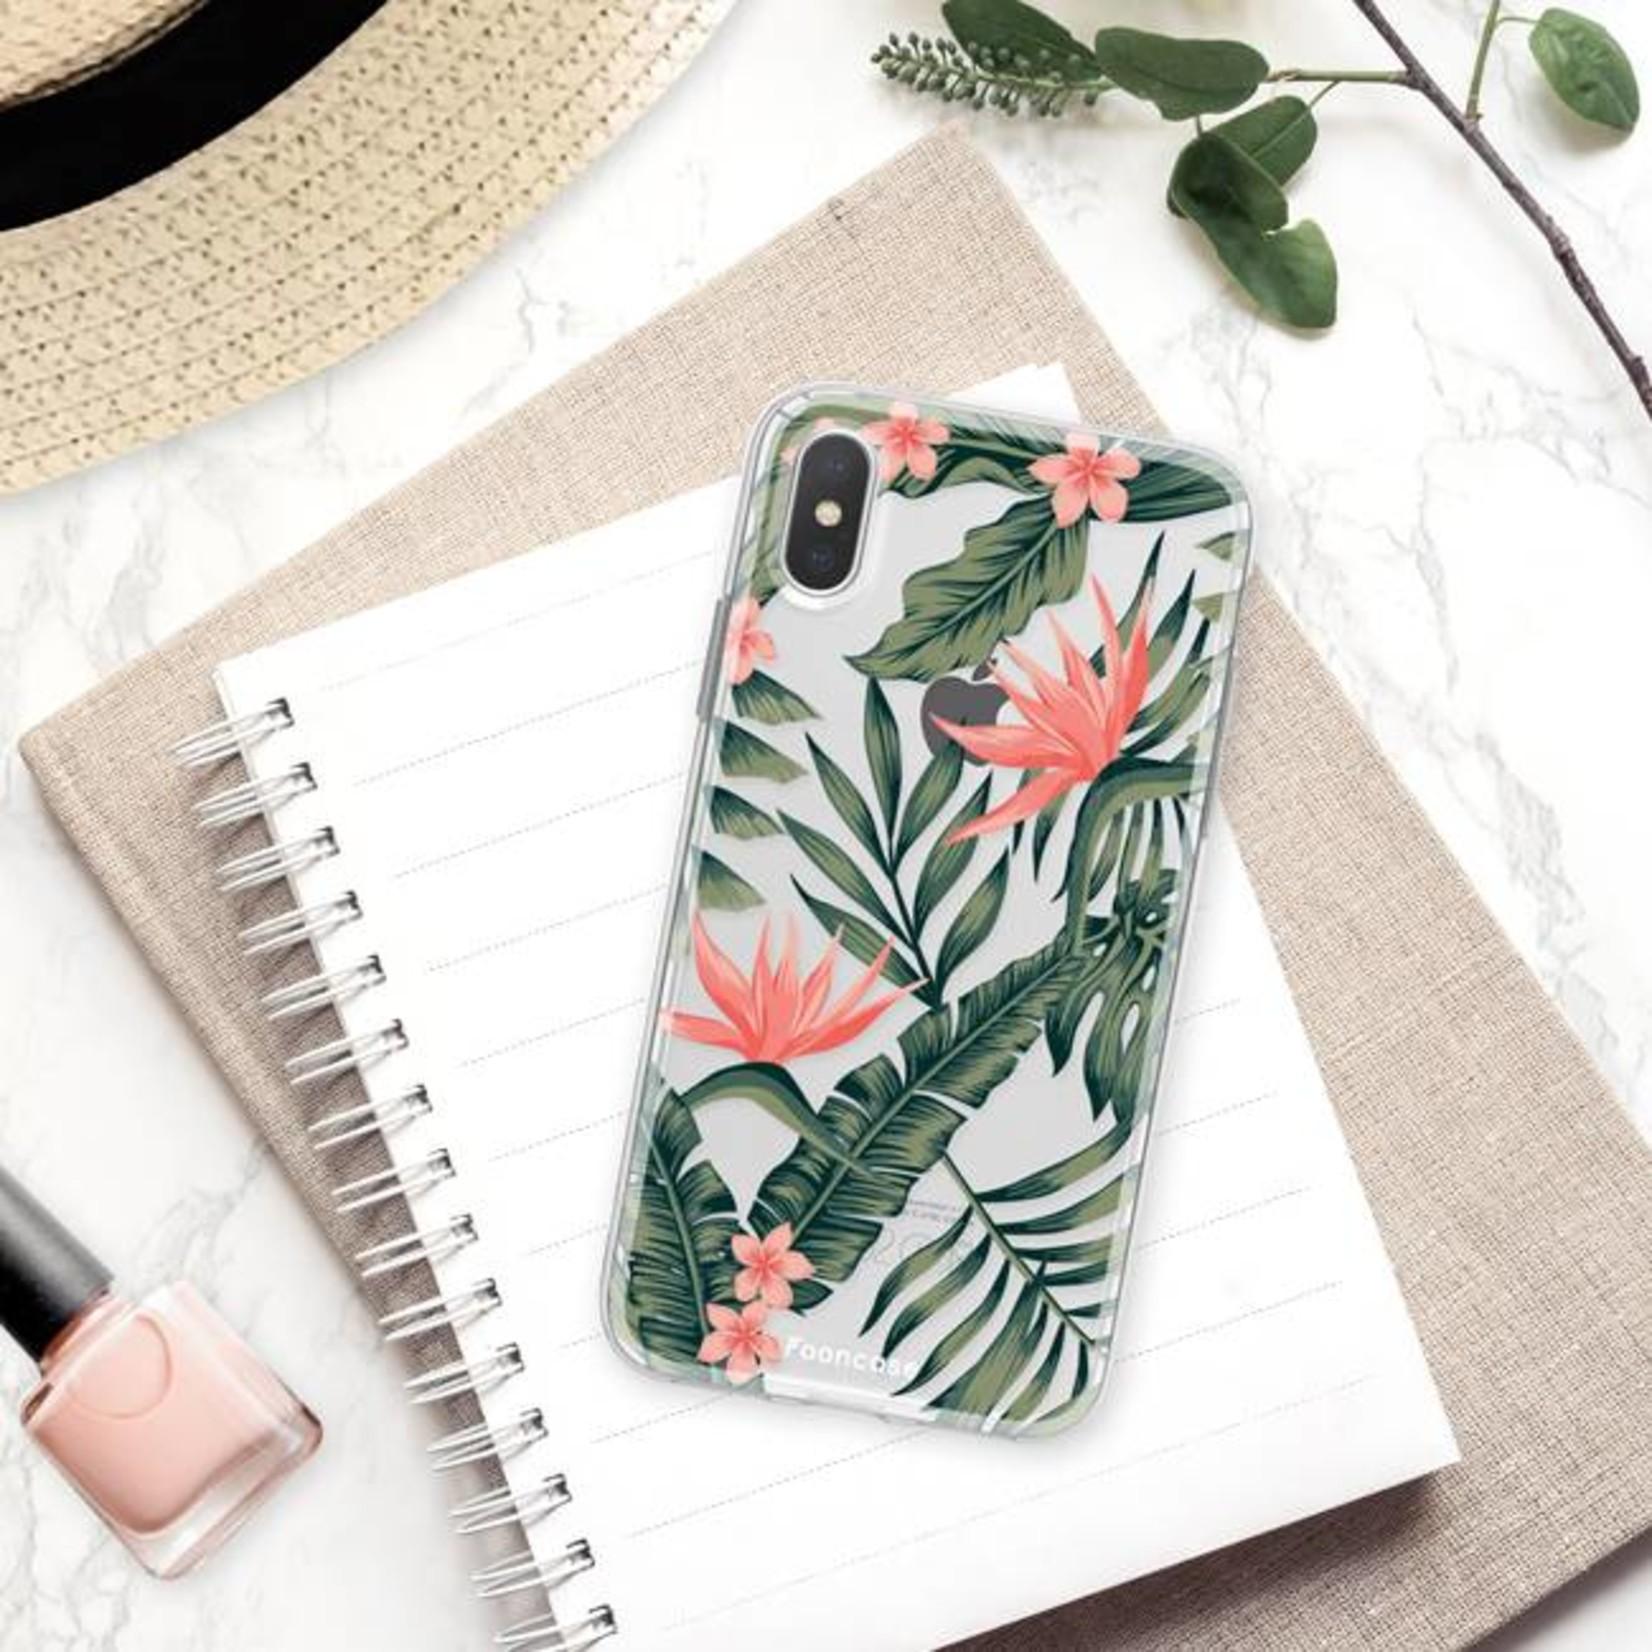 FOONCASE iPhone XS hoesje TPU Soft Case - Back Cover - Tropical Desire / Bladeren / Roze